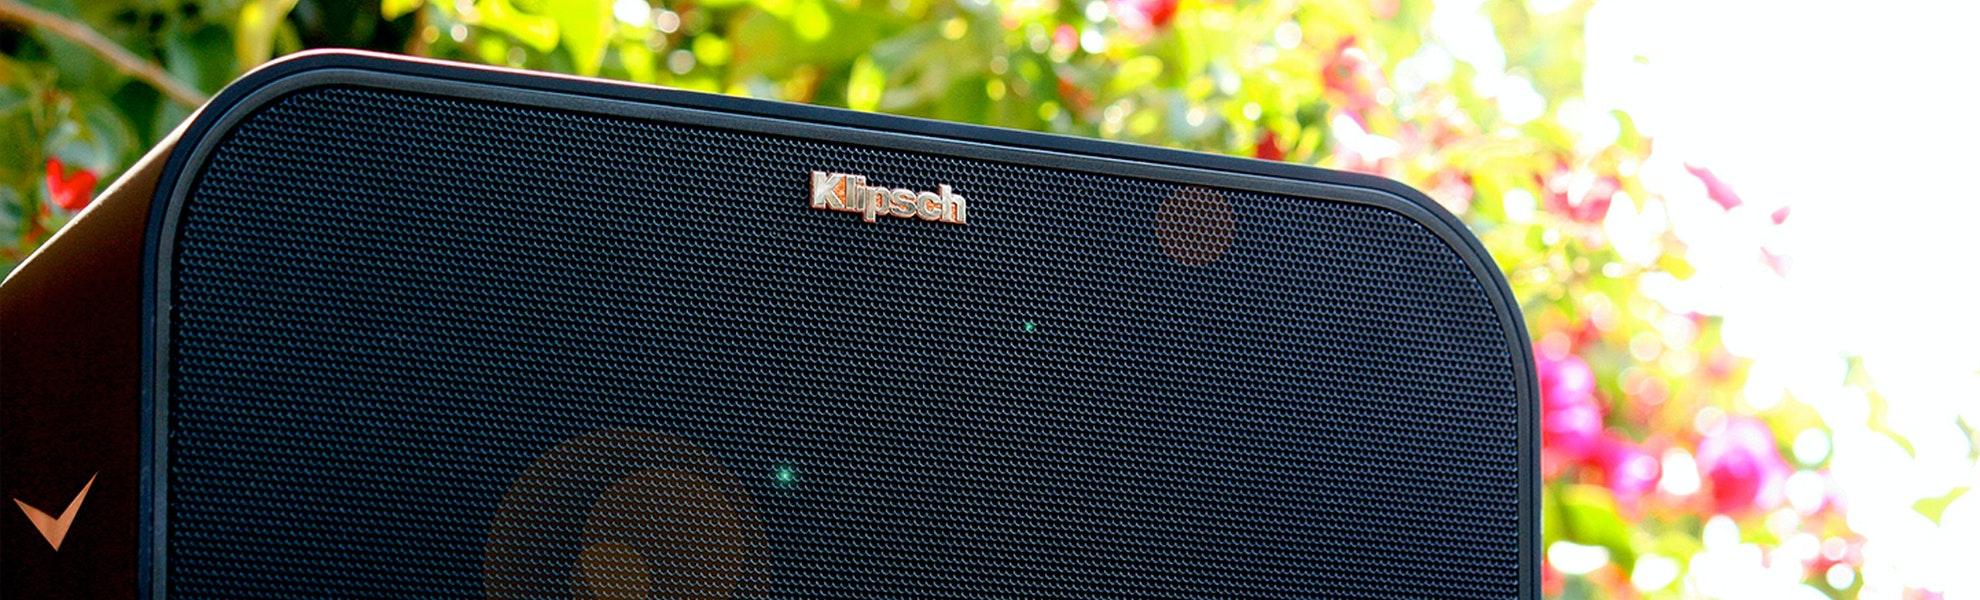 Klipsch KMC 3 Wireless Music System